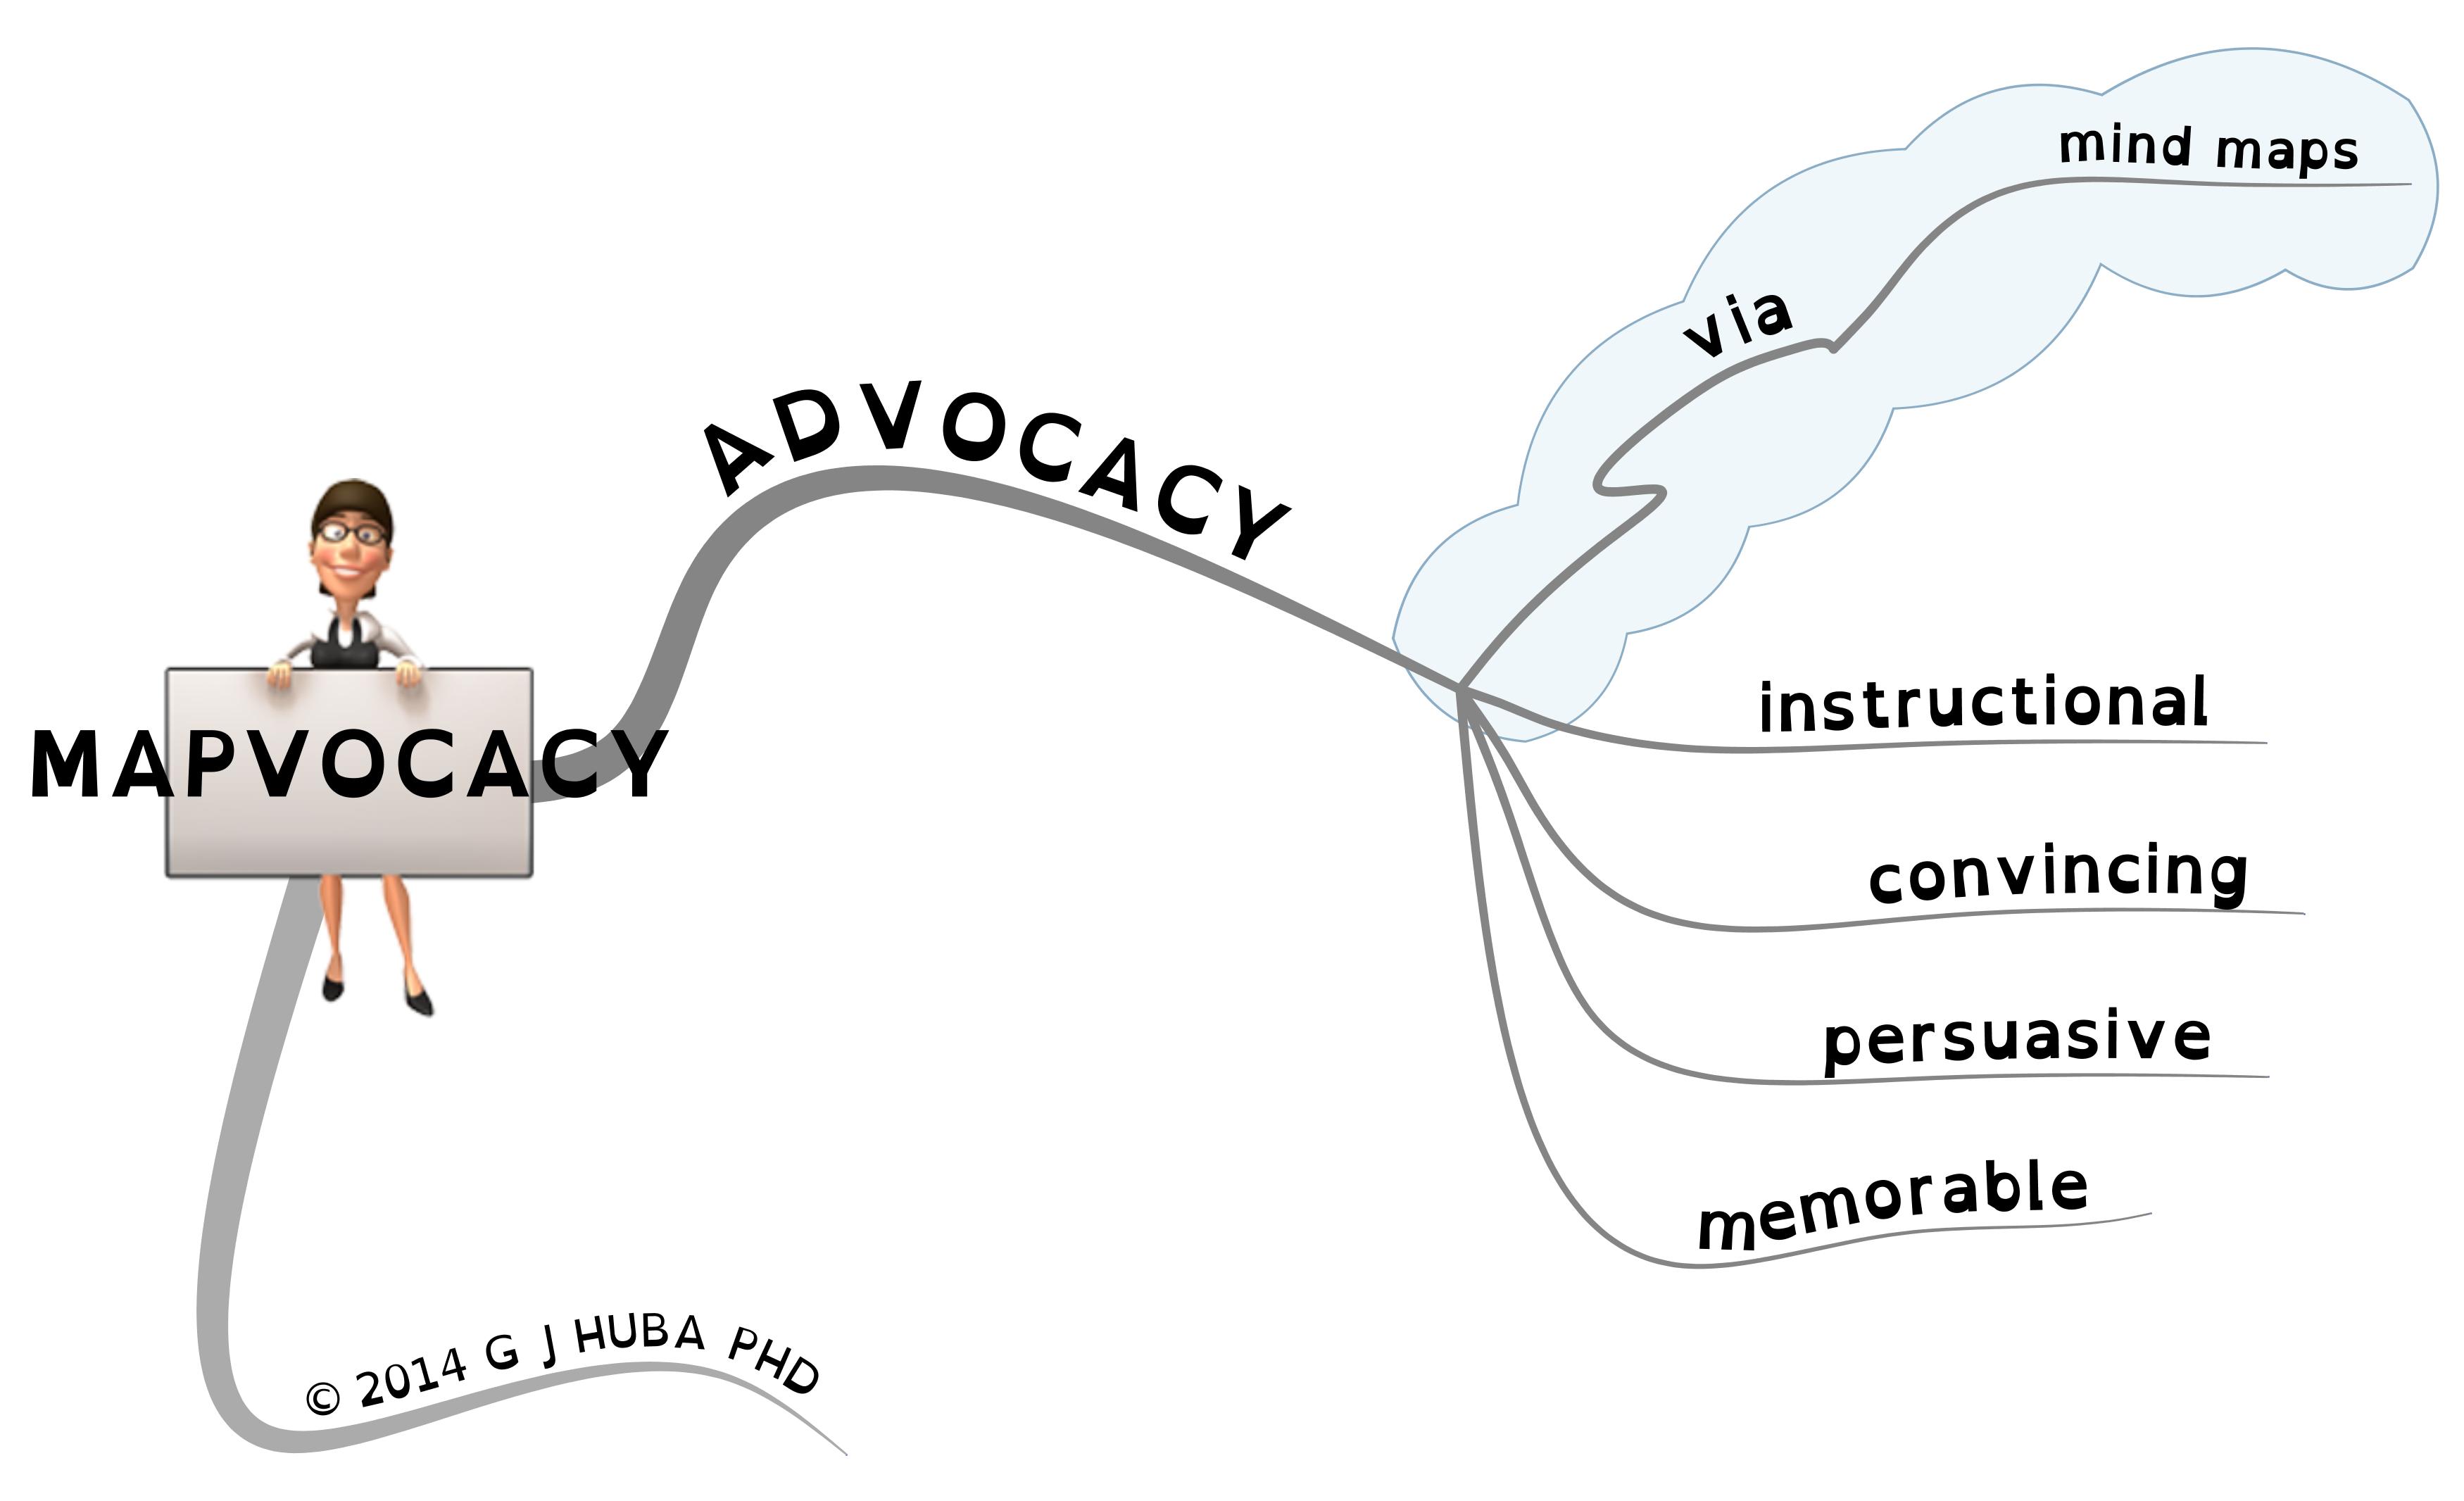 mapvocacy opendyslexic